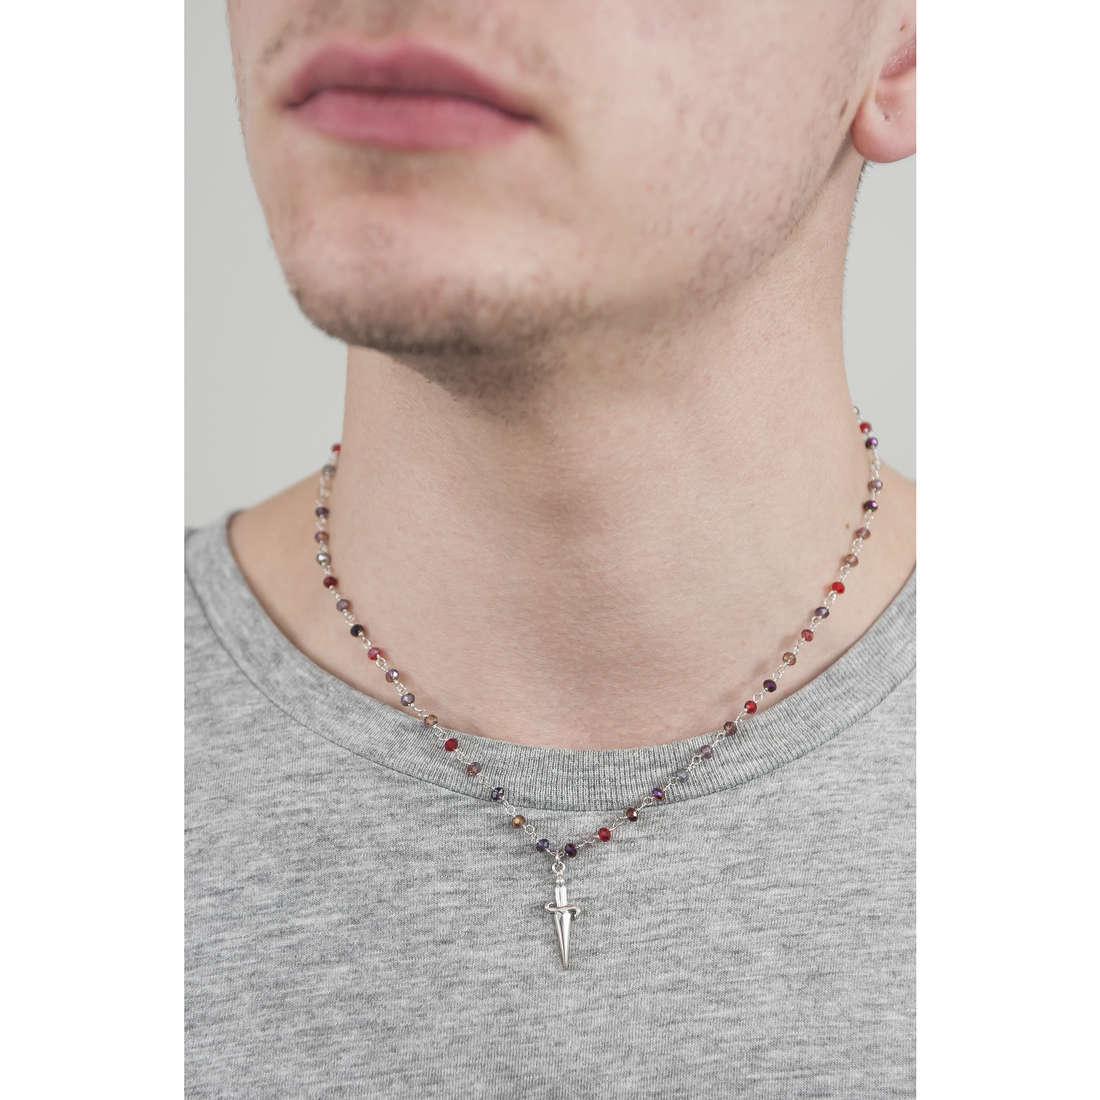 Cesare Paciotti necklaces man JPCL1203B indosso